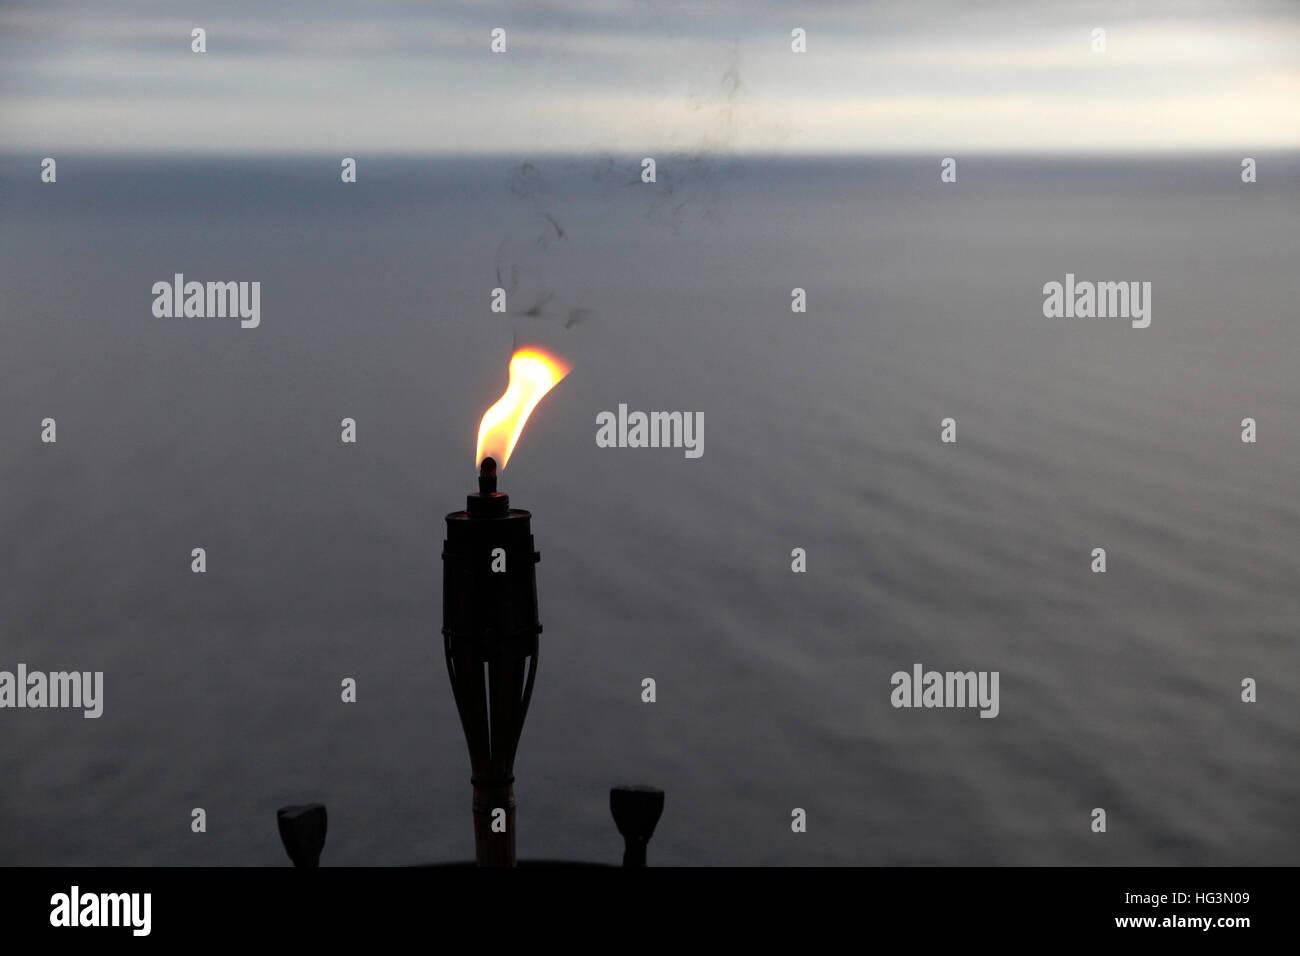 torch in front of the mediterranean sea at far de sant sebasti agrave  stock photo torch in front of the mediterranean sea at far de sant sebastiagrave lighthouse llafranc girona costa brava catalonia spain